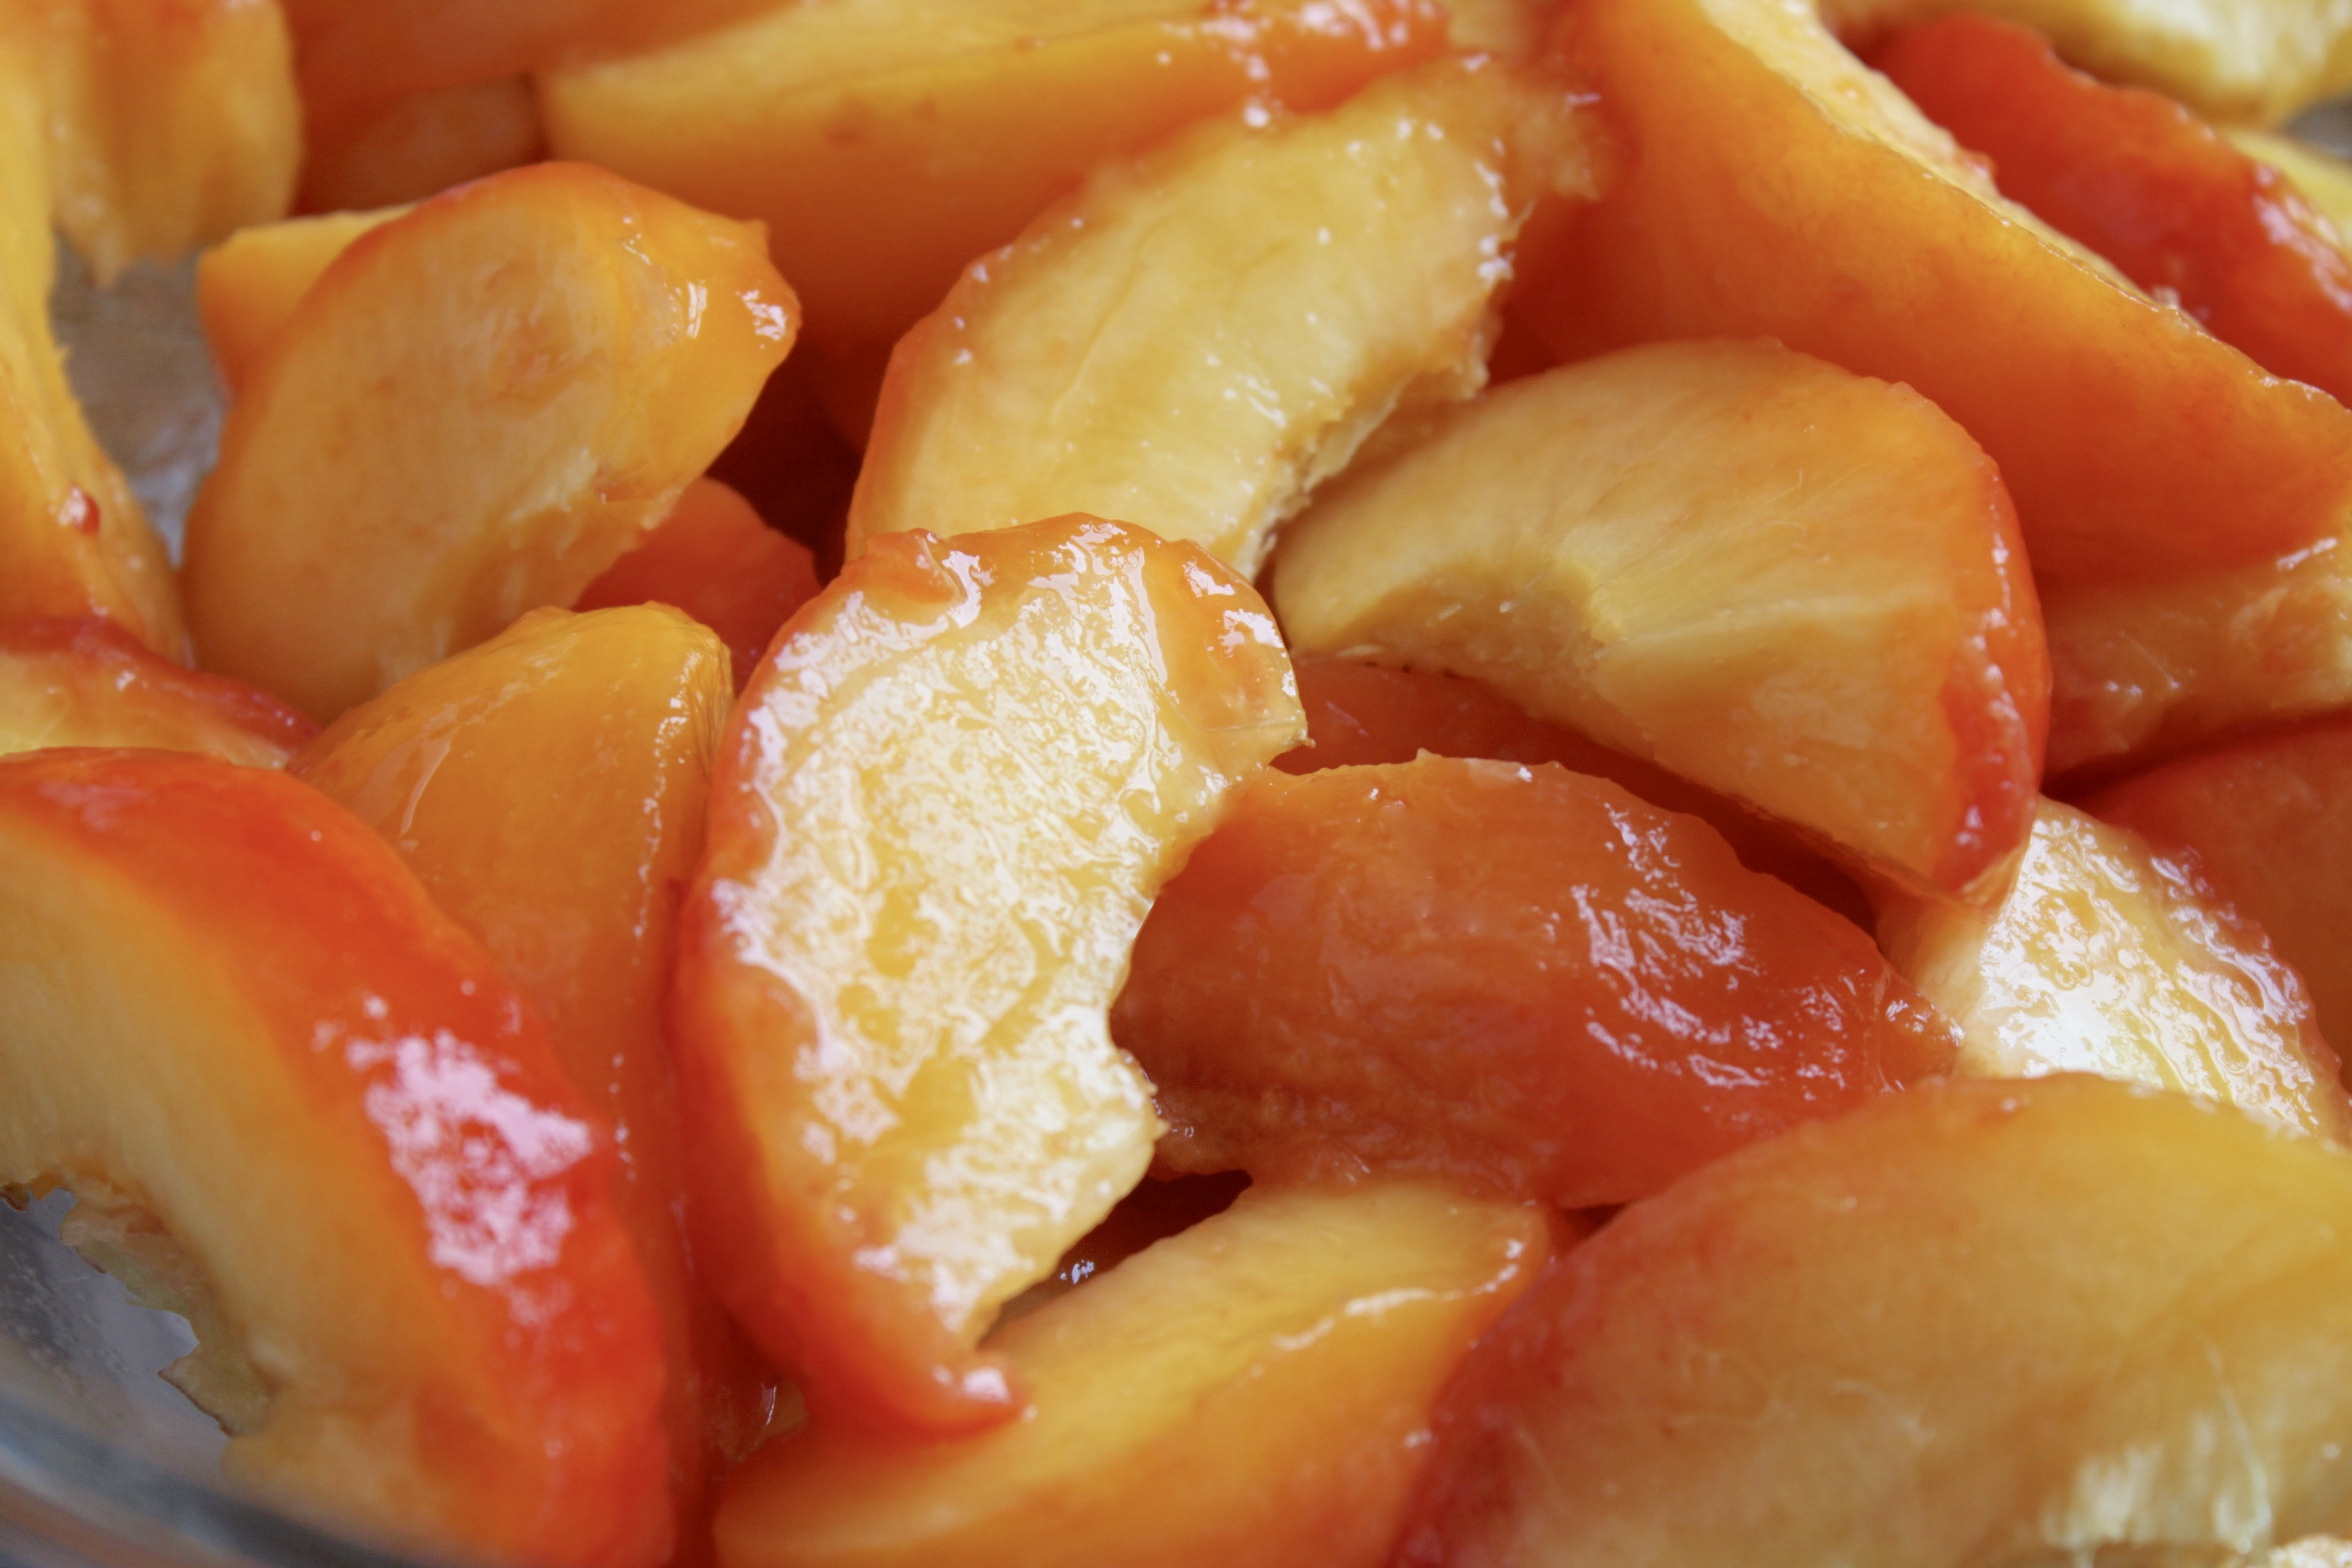 sliced, peeled peaches